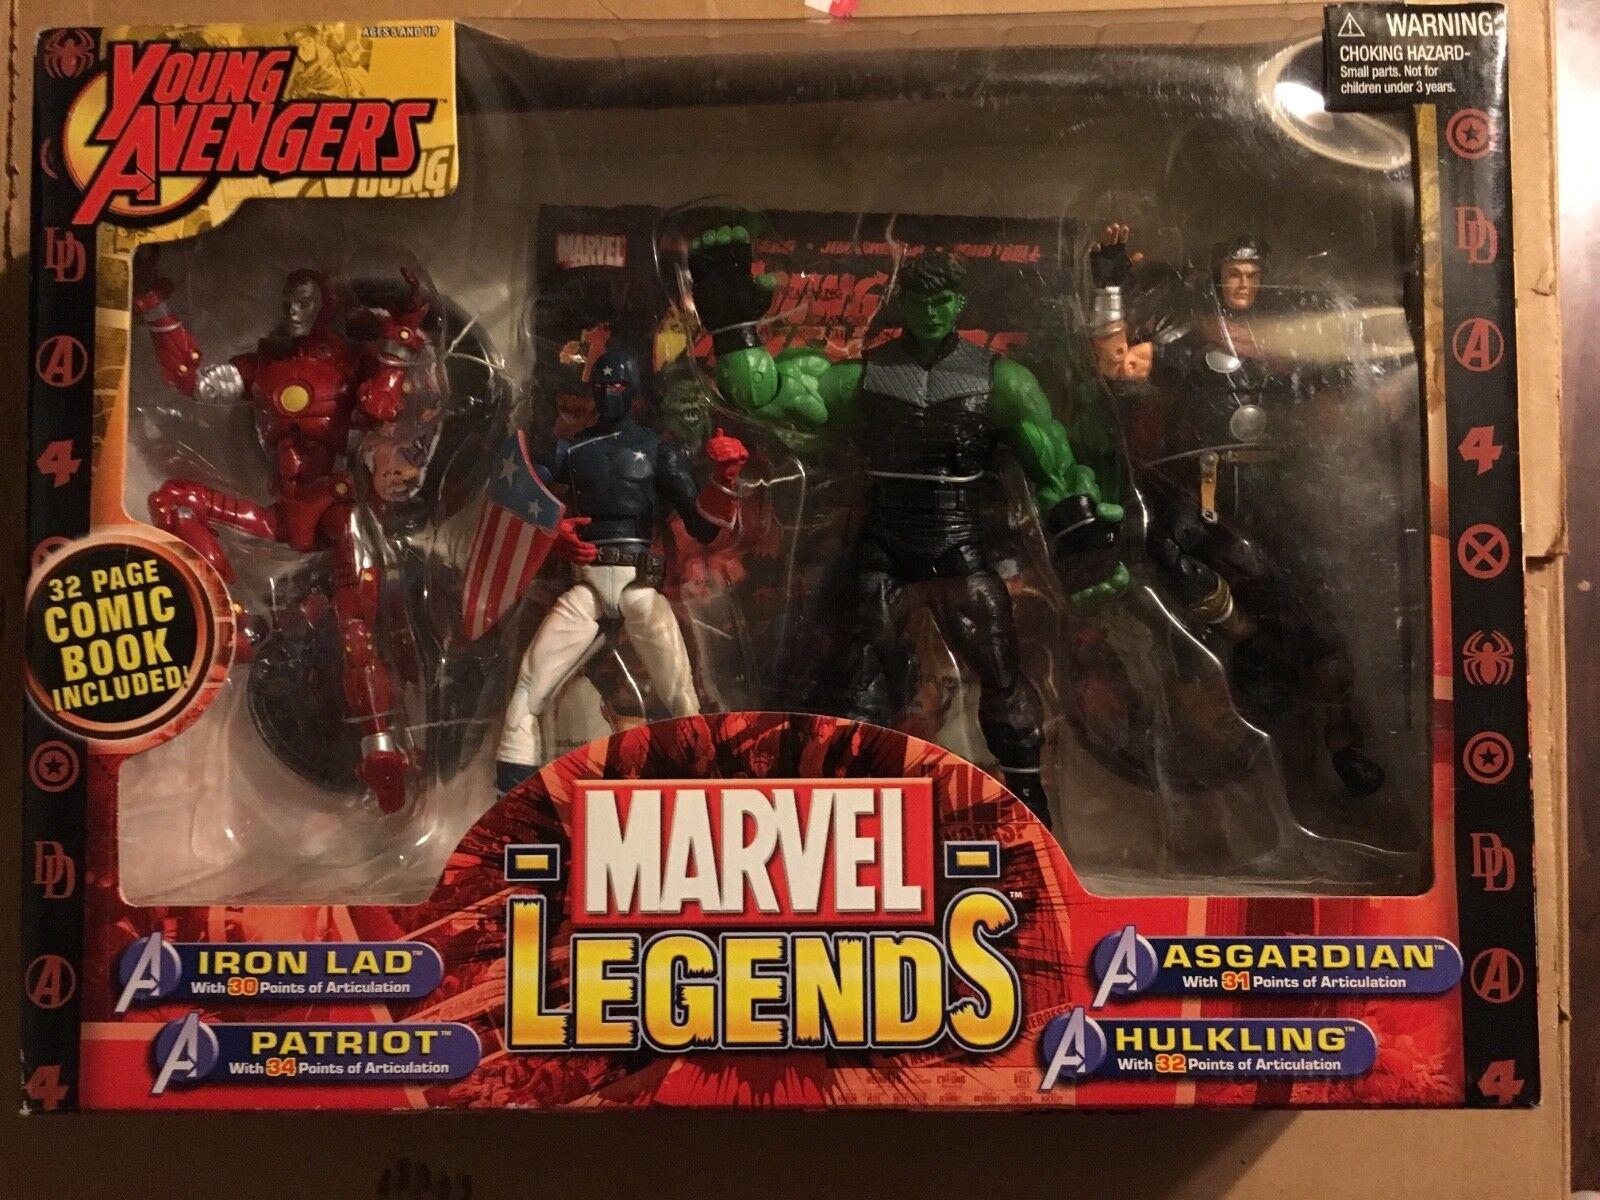 Marvel Legends Young Avengers 6  Figures Iron Lad, Patriot, Asgardian, Hulkling